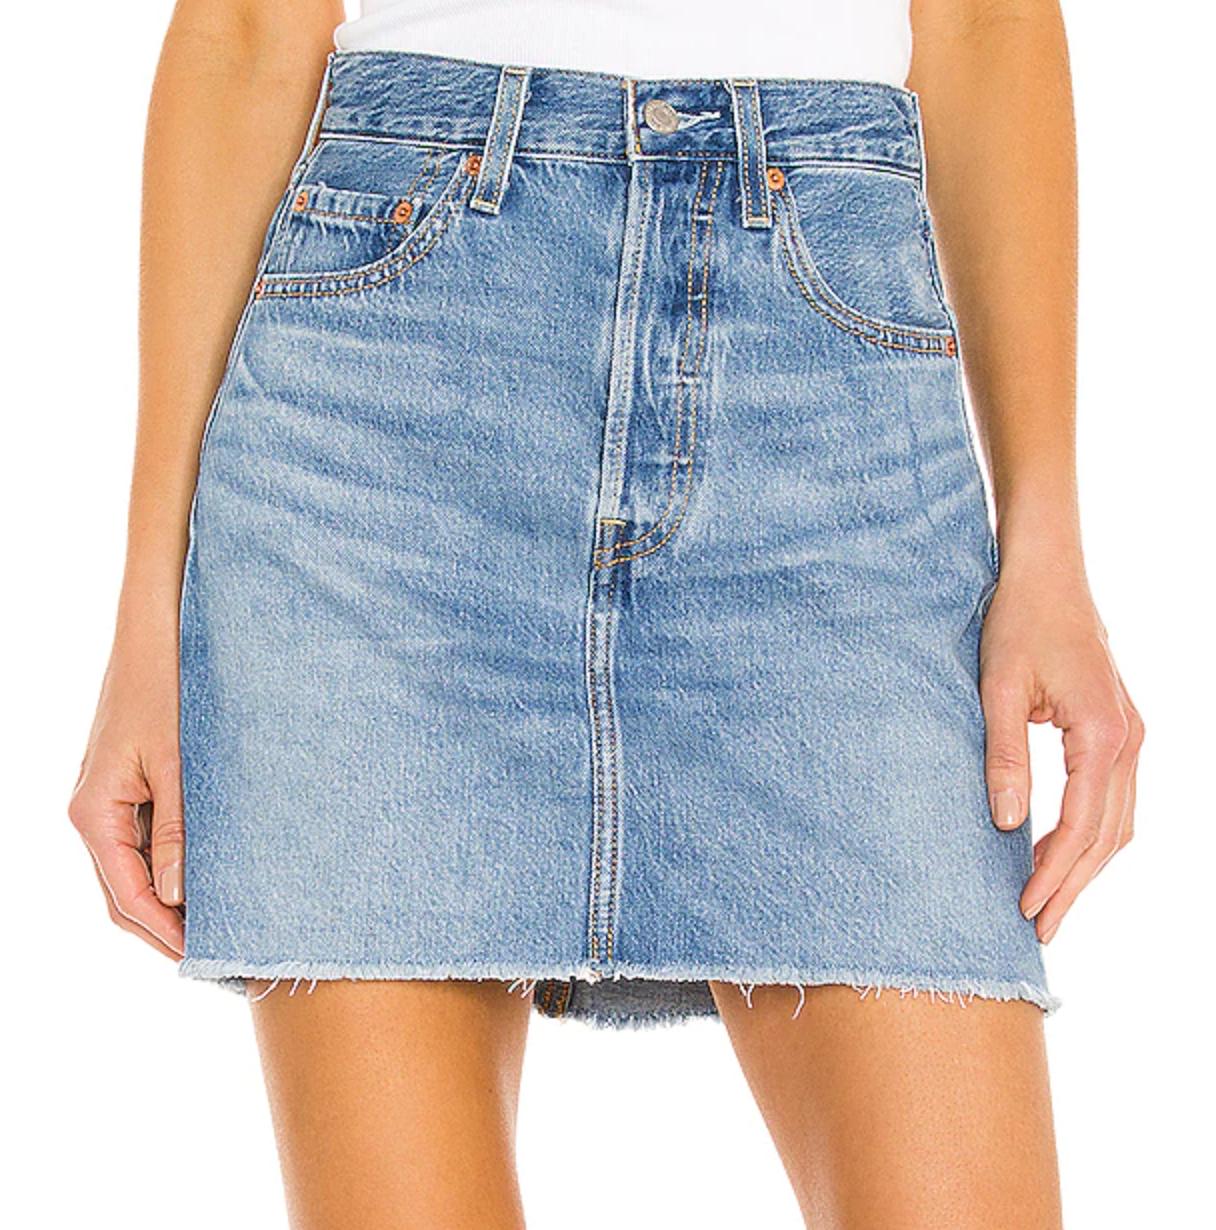 a light wash levi's denim skirt